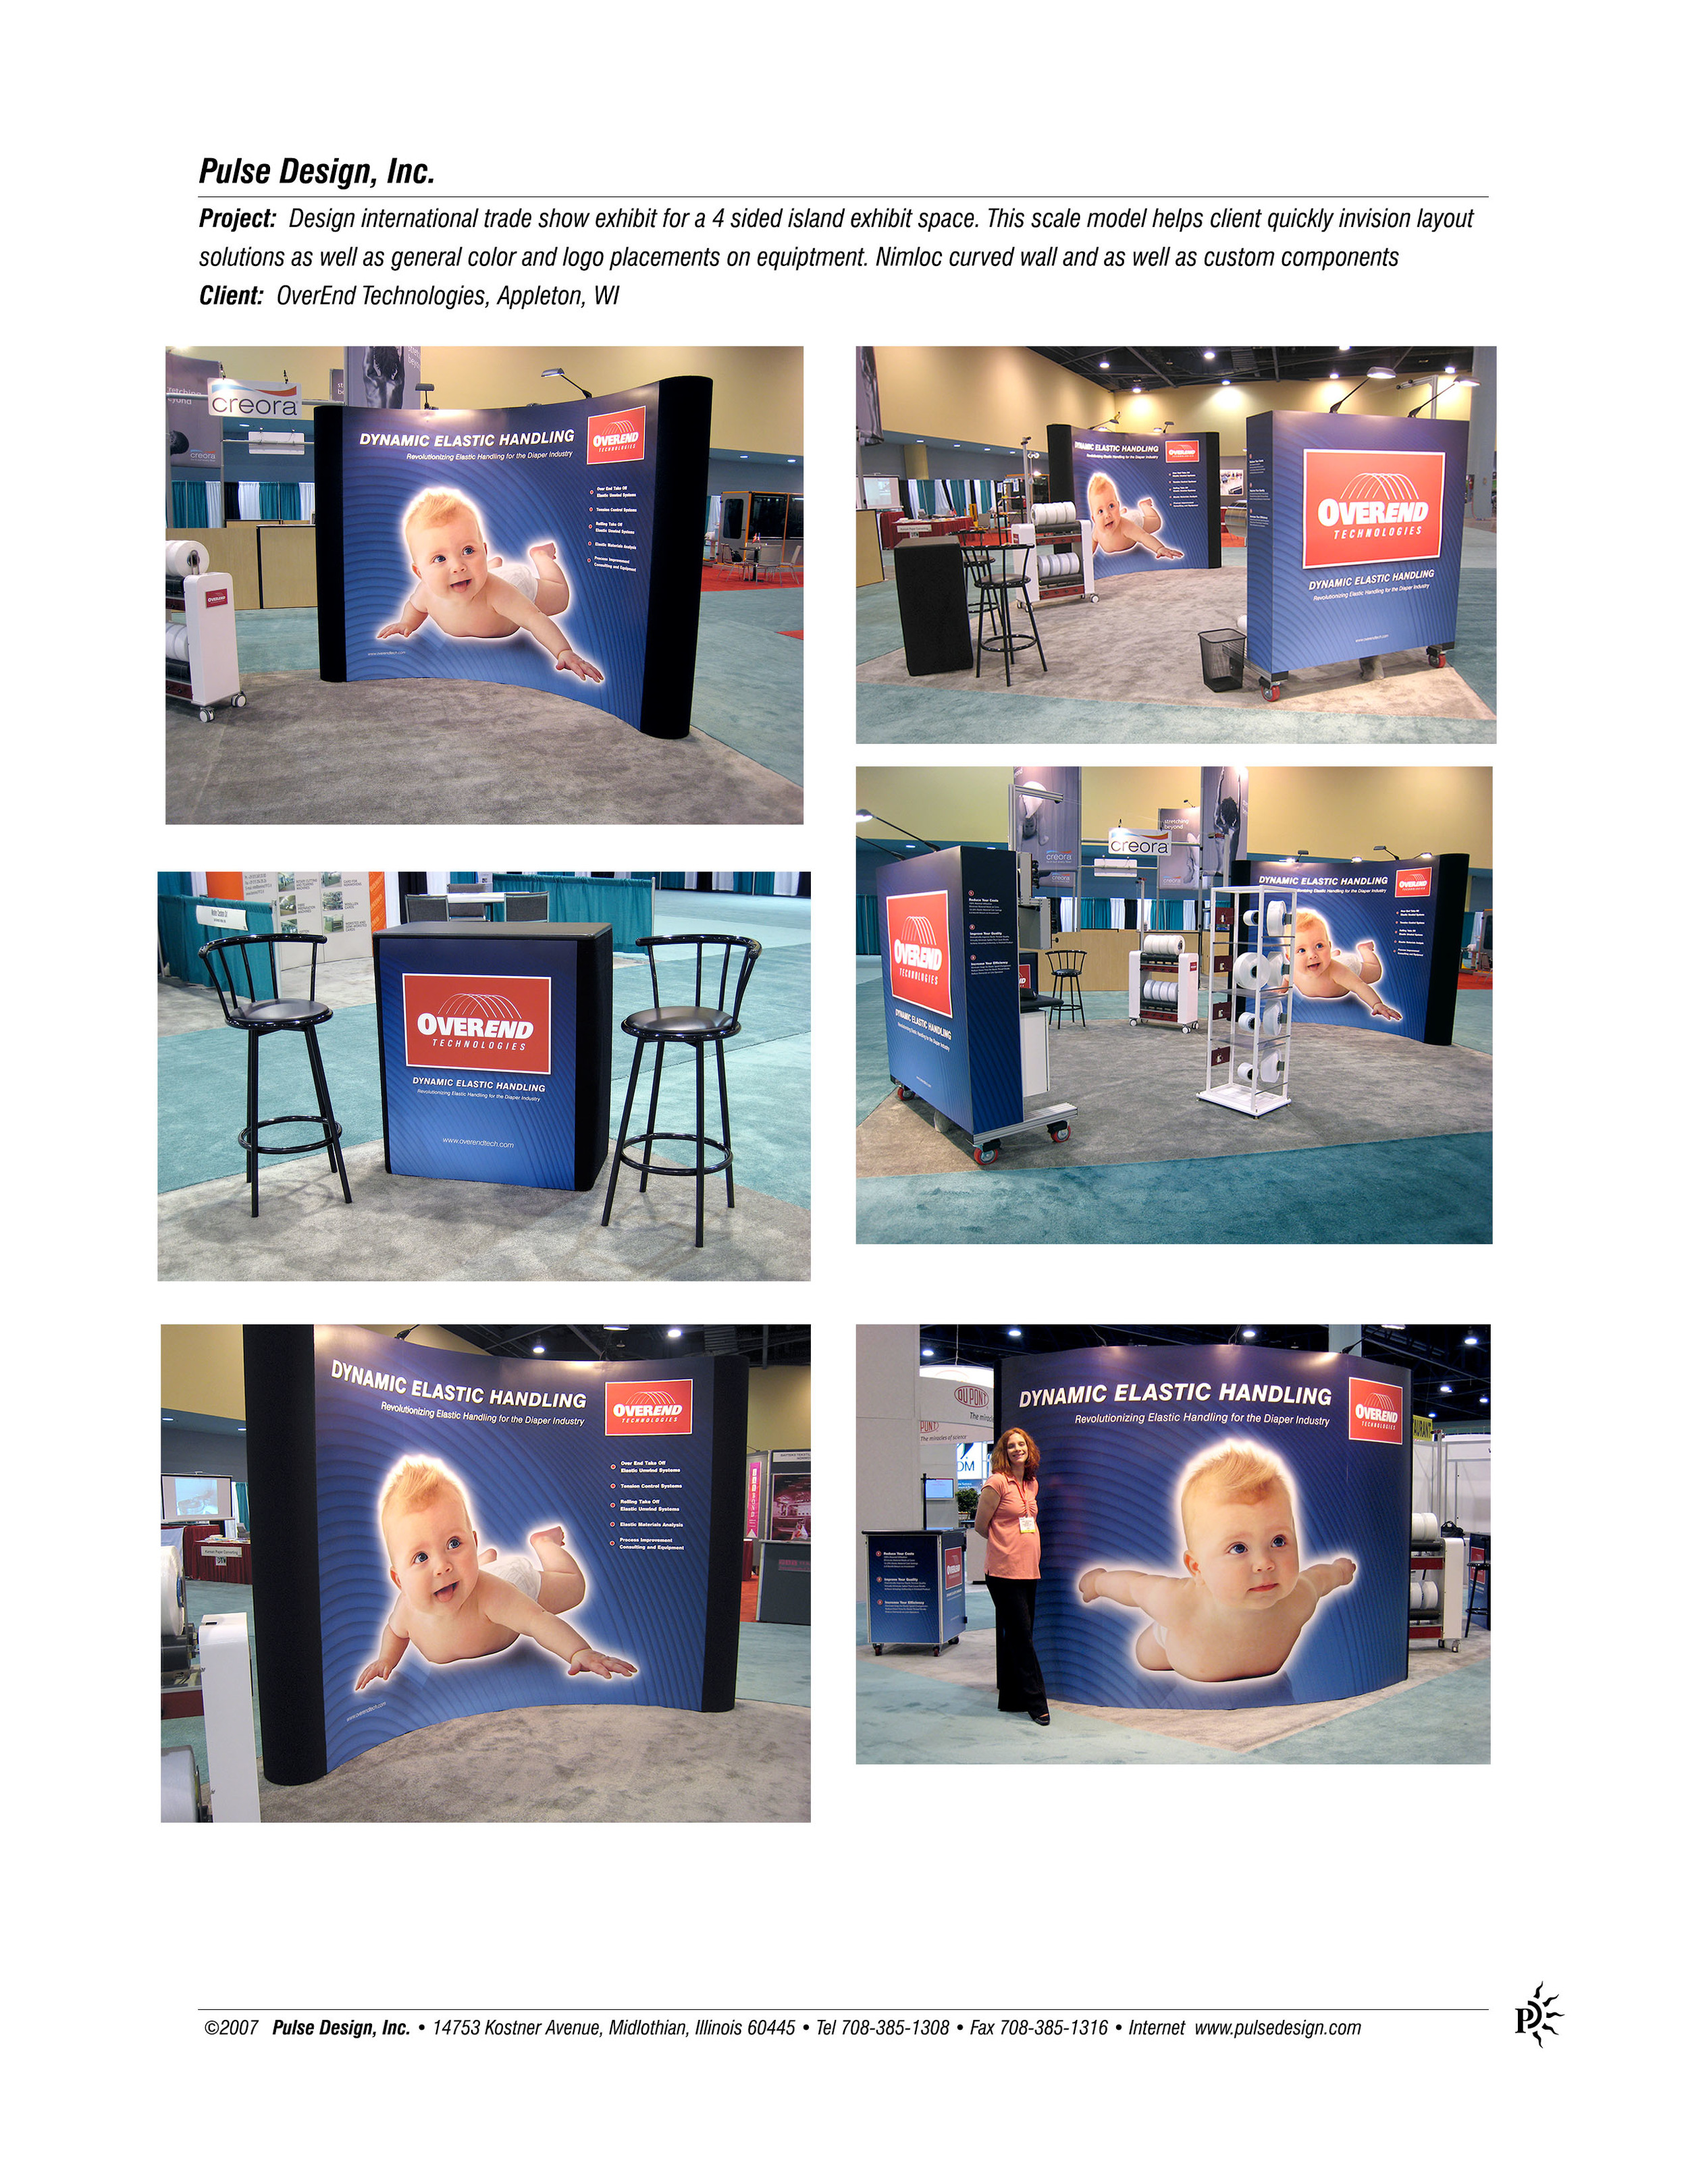 Overend-Trade-Show-Photos-Pulse-Design-Inc.jpg